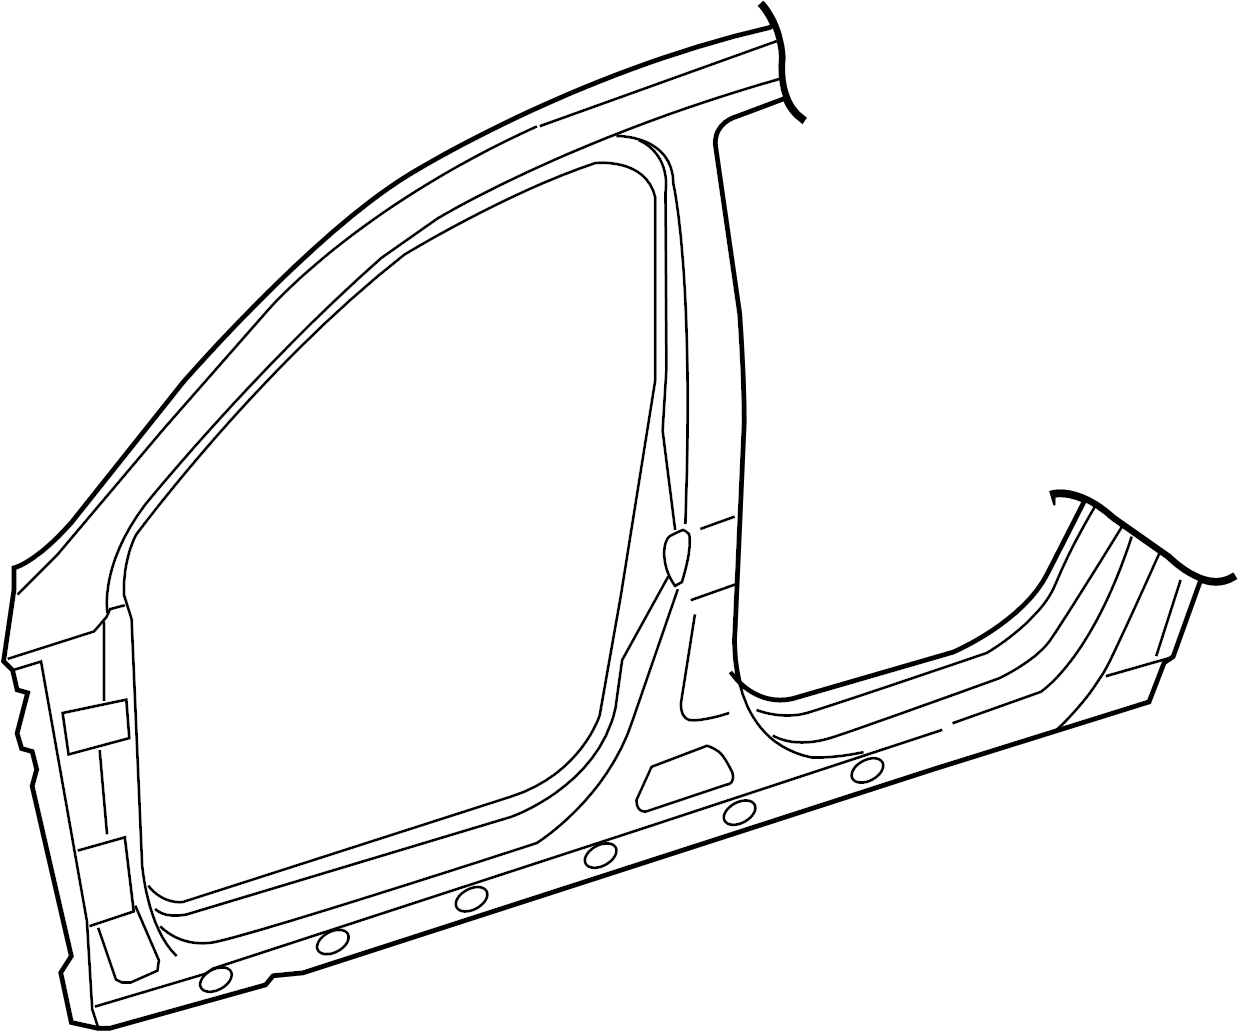 Volkswagen Passat Sectional Part Pillar A B With Side Member Pillar A With Side M Subpart